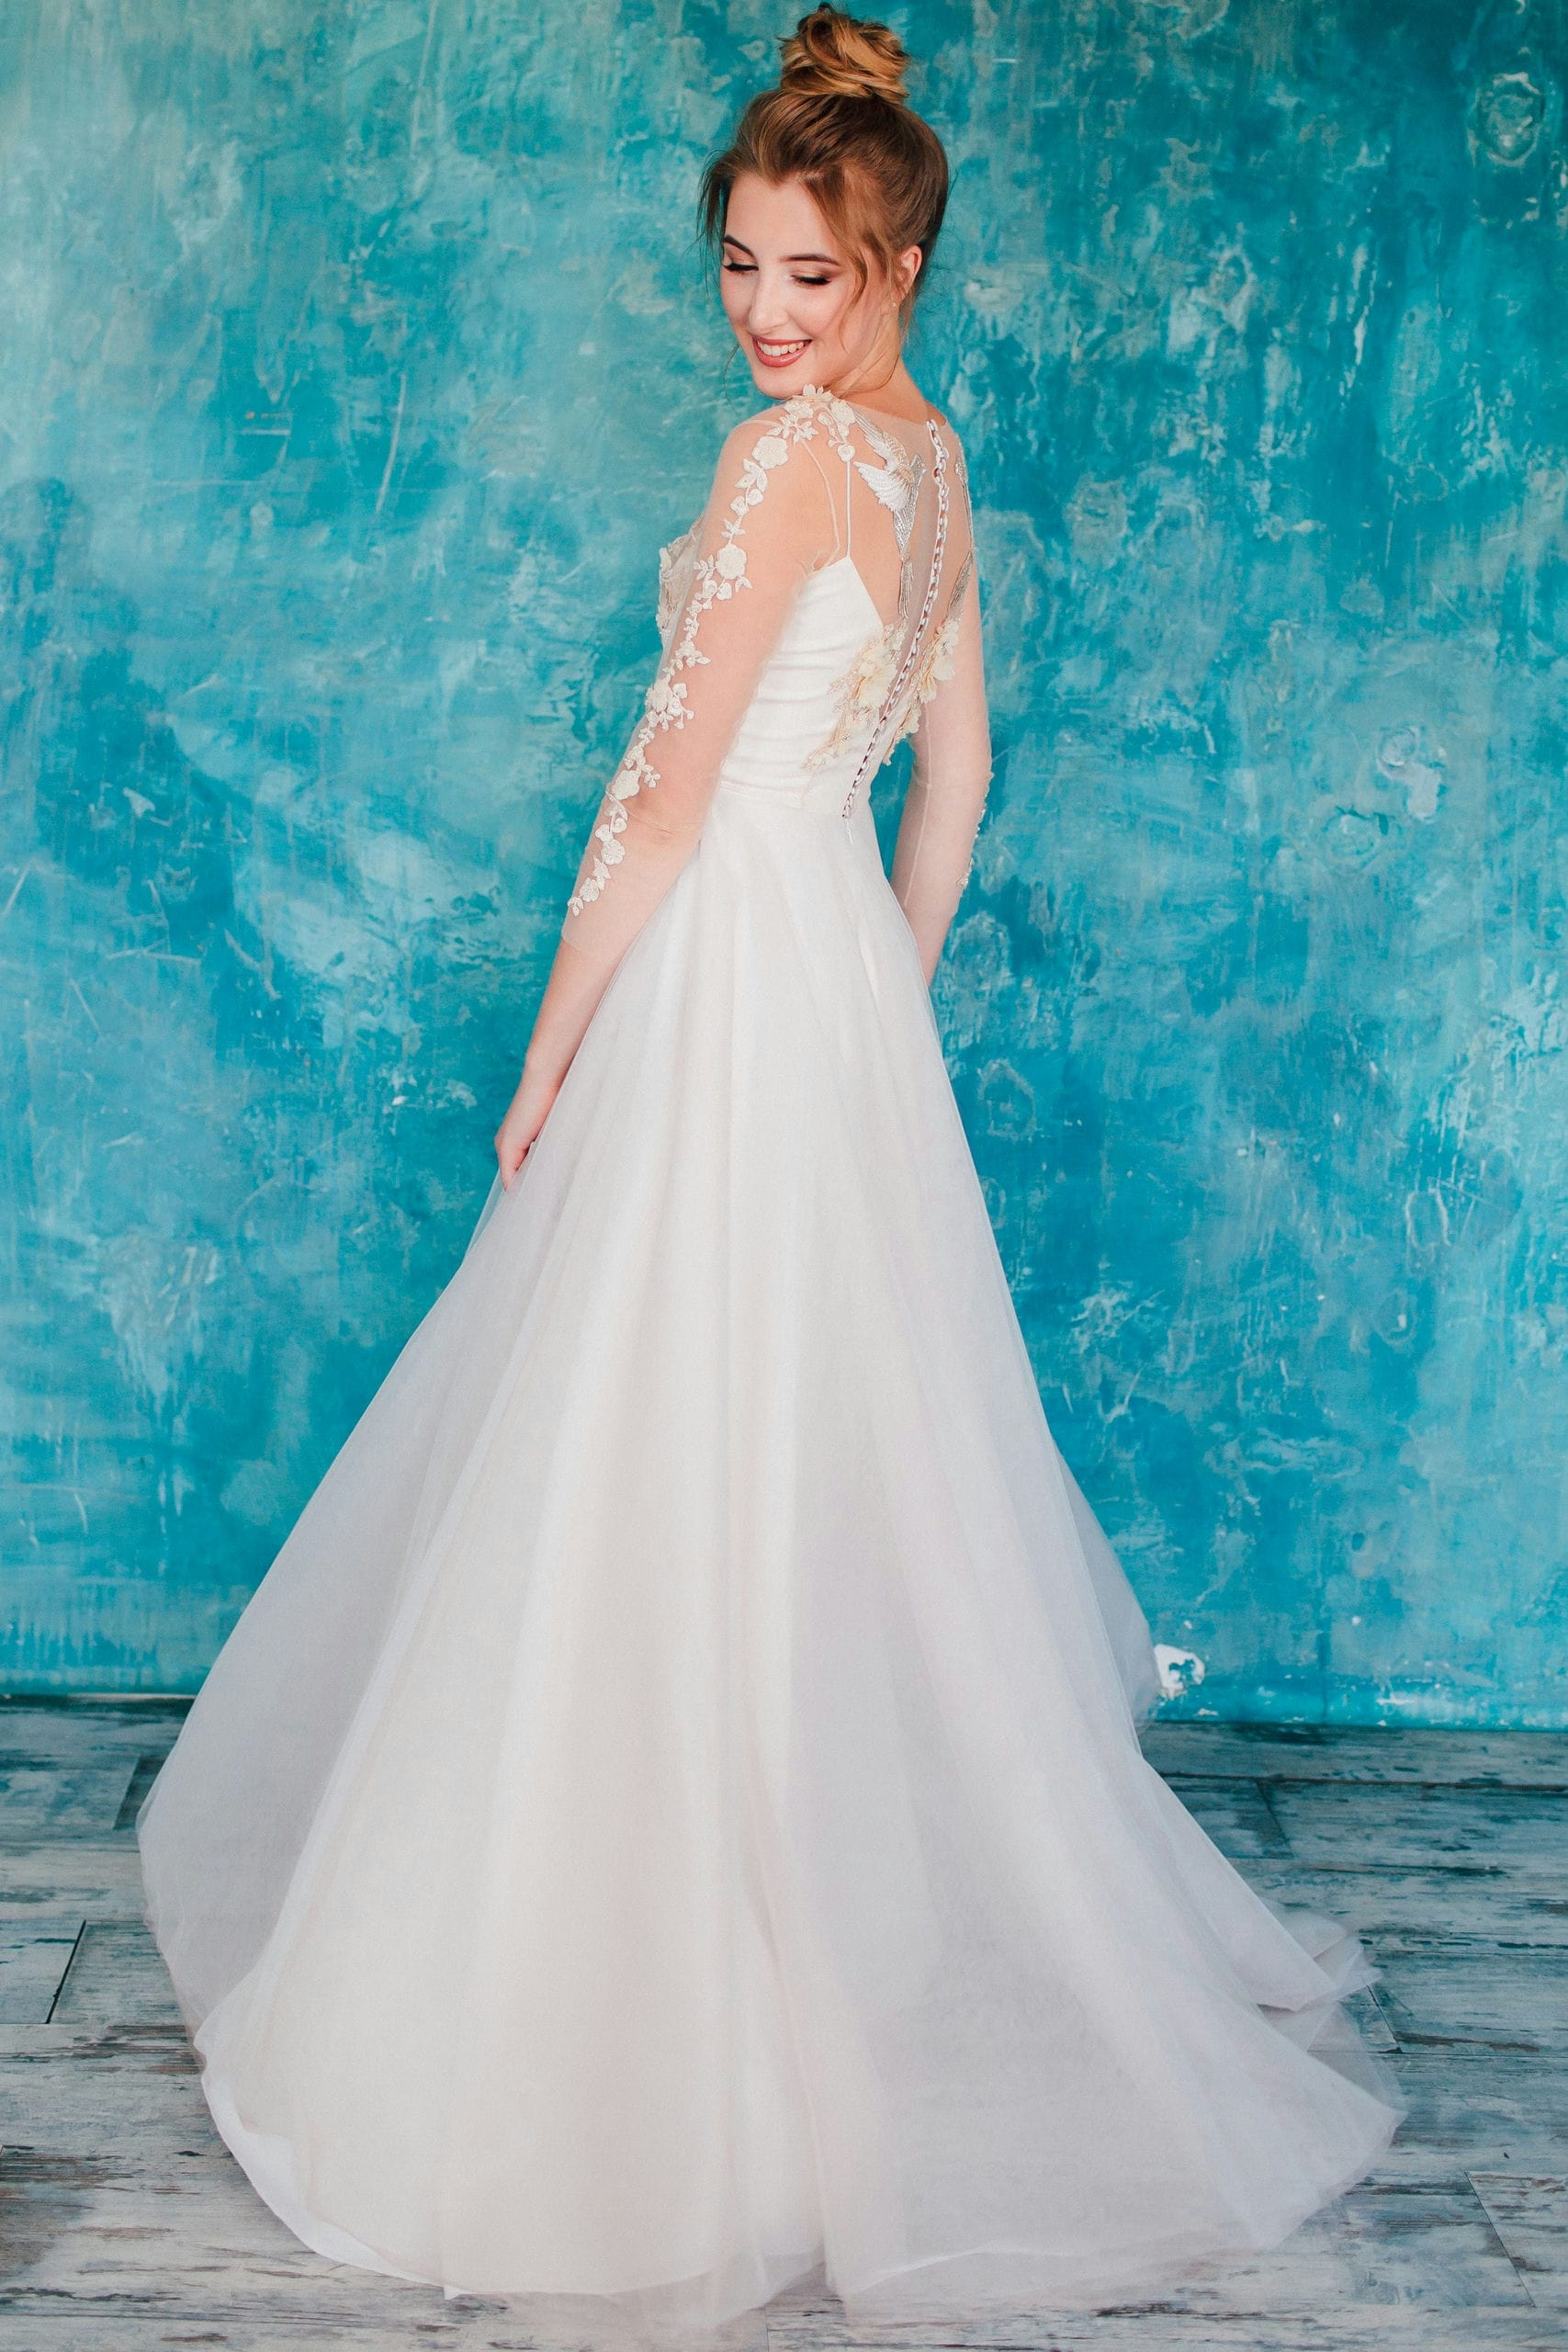 Свадебное платье ARIELA, коллекция THE ANGELS, бренд RARE BRIDAL, фото 3